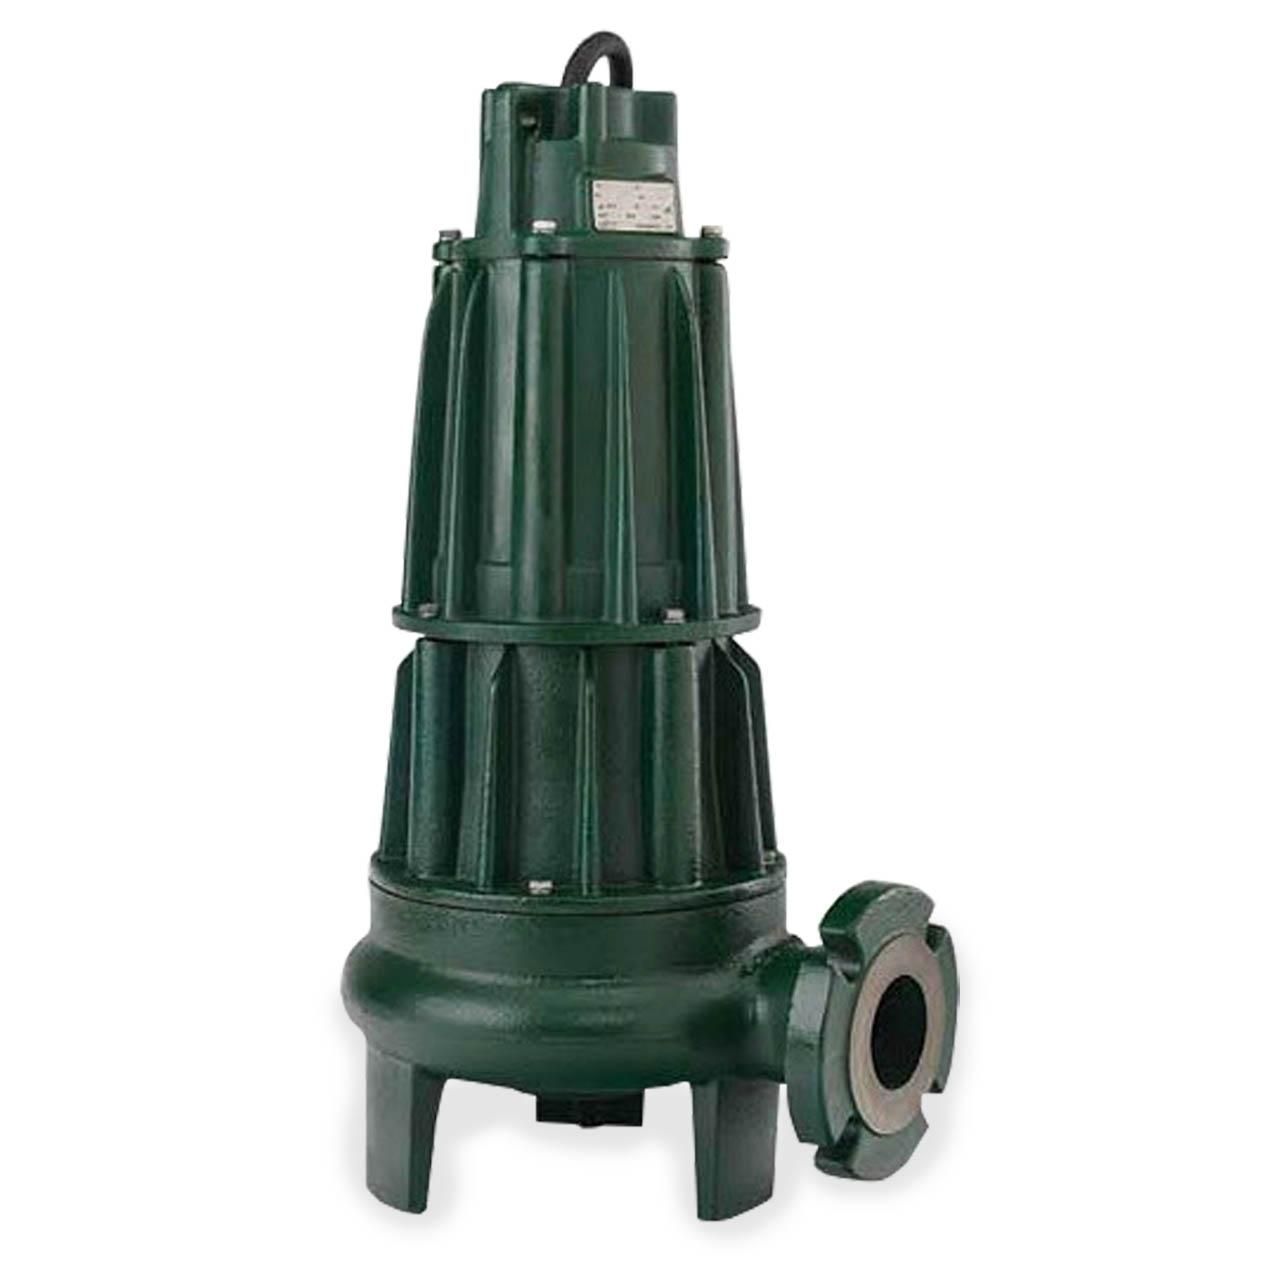 Zoeller Zoeller 631 0009 Model F631 Sewage Waste Dewatering Non Clog Pump 2 0 Hp 230v 3ph 25 Cord Horizontal Discharge Zlr631 0009